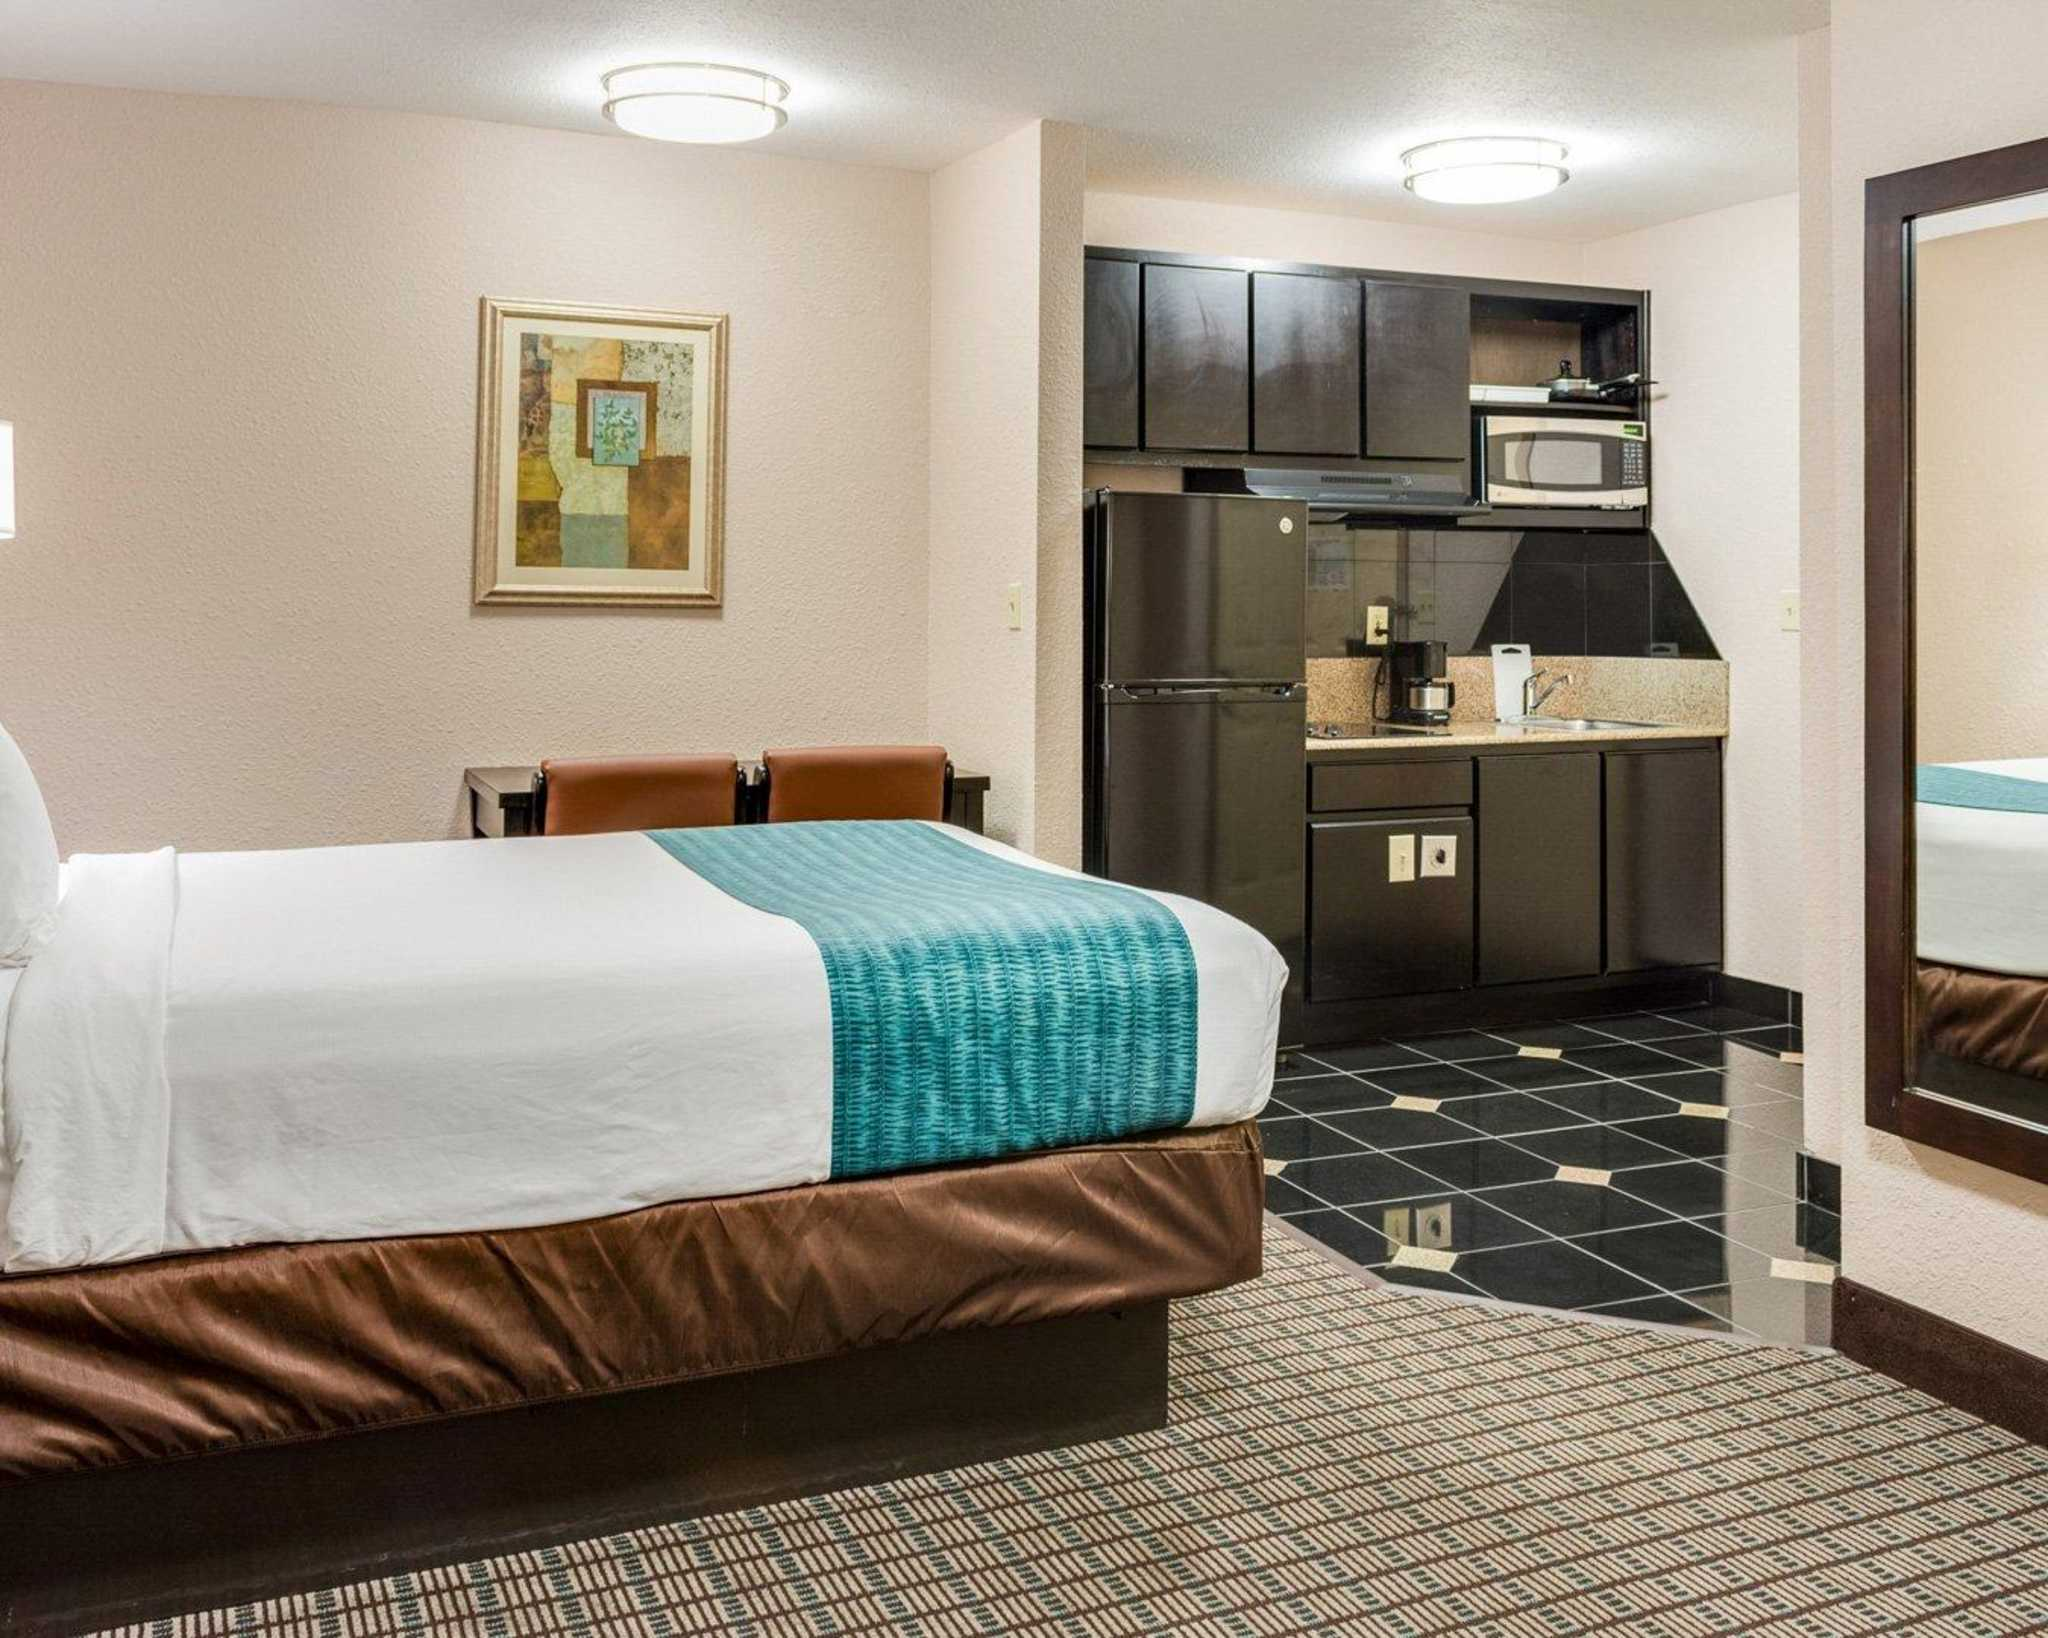 Hotels Near Avondale La